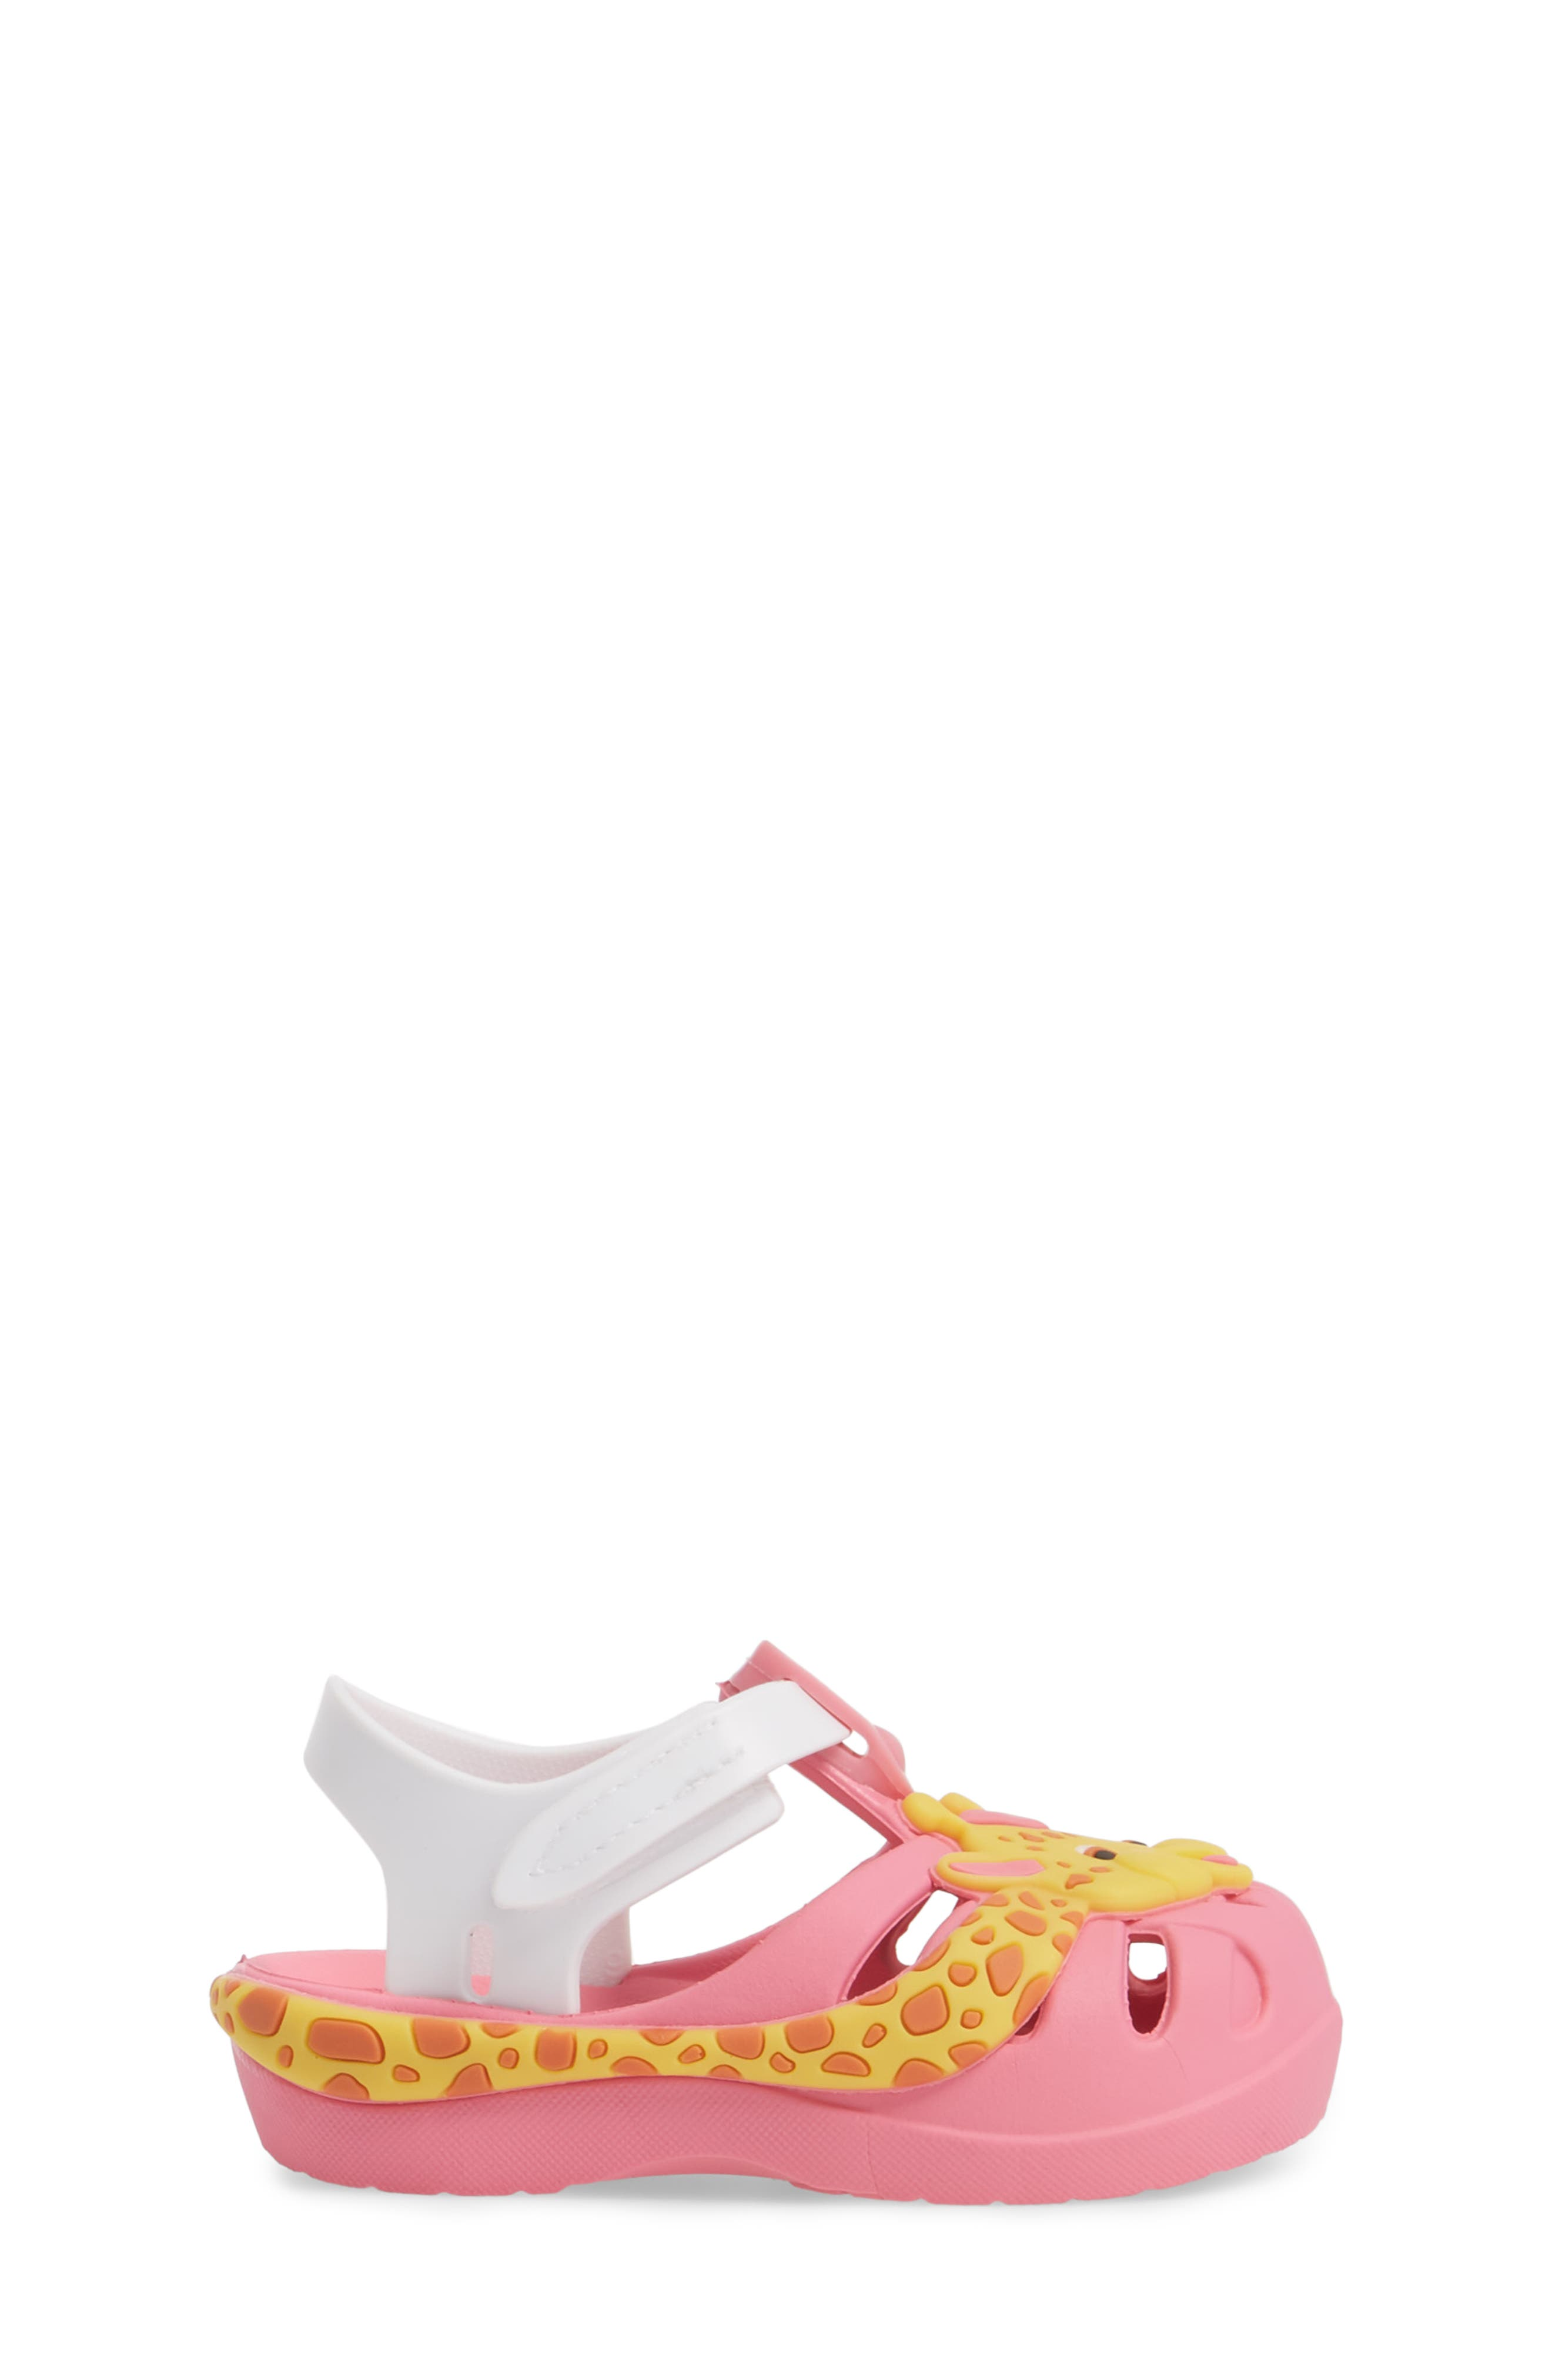 Summer Baby Waterproof Sandal,                             Alternate thumbnail 3, color,                             Pink/ White